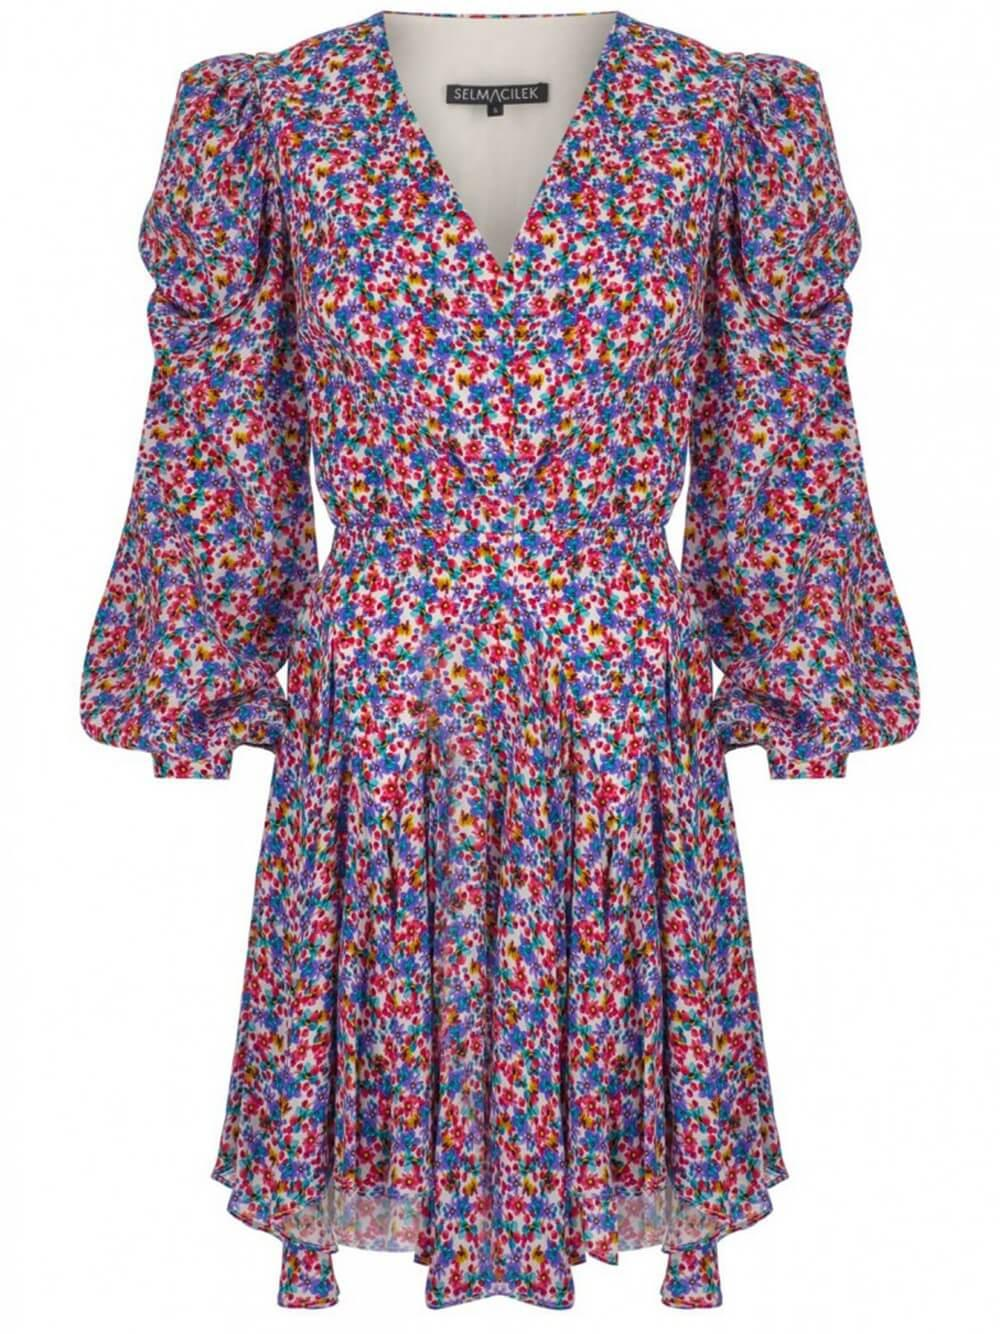 Long Sleeve Floral Dress Item # SS2032